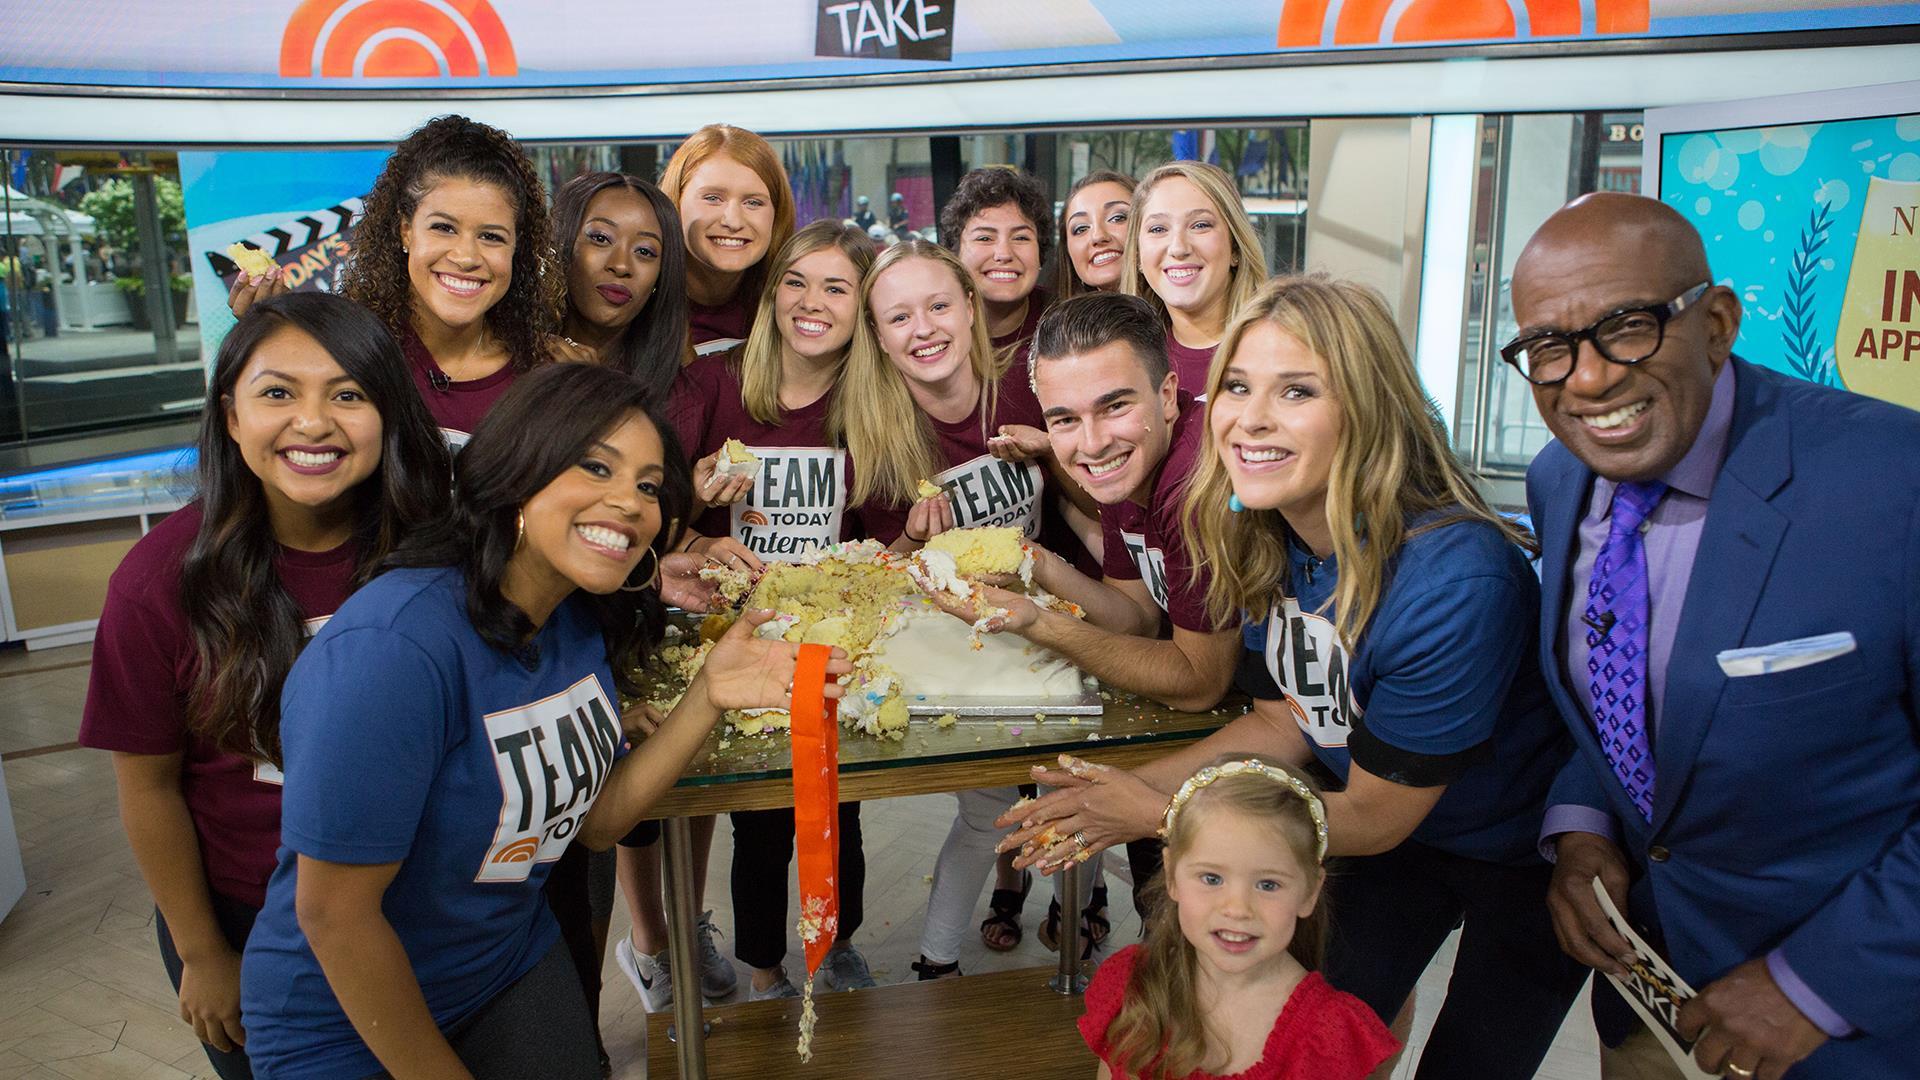 Can Jenna Bush Hager and Sheinelle Jones outdo NBC summer interns? Watch!